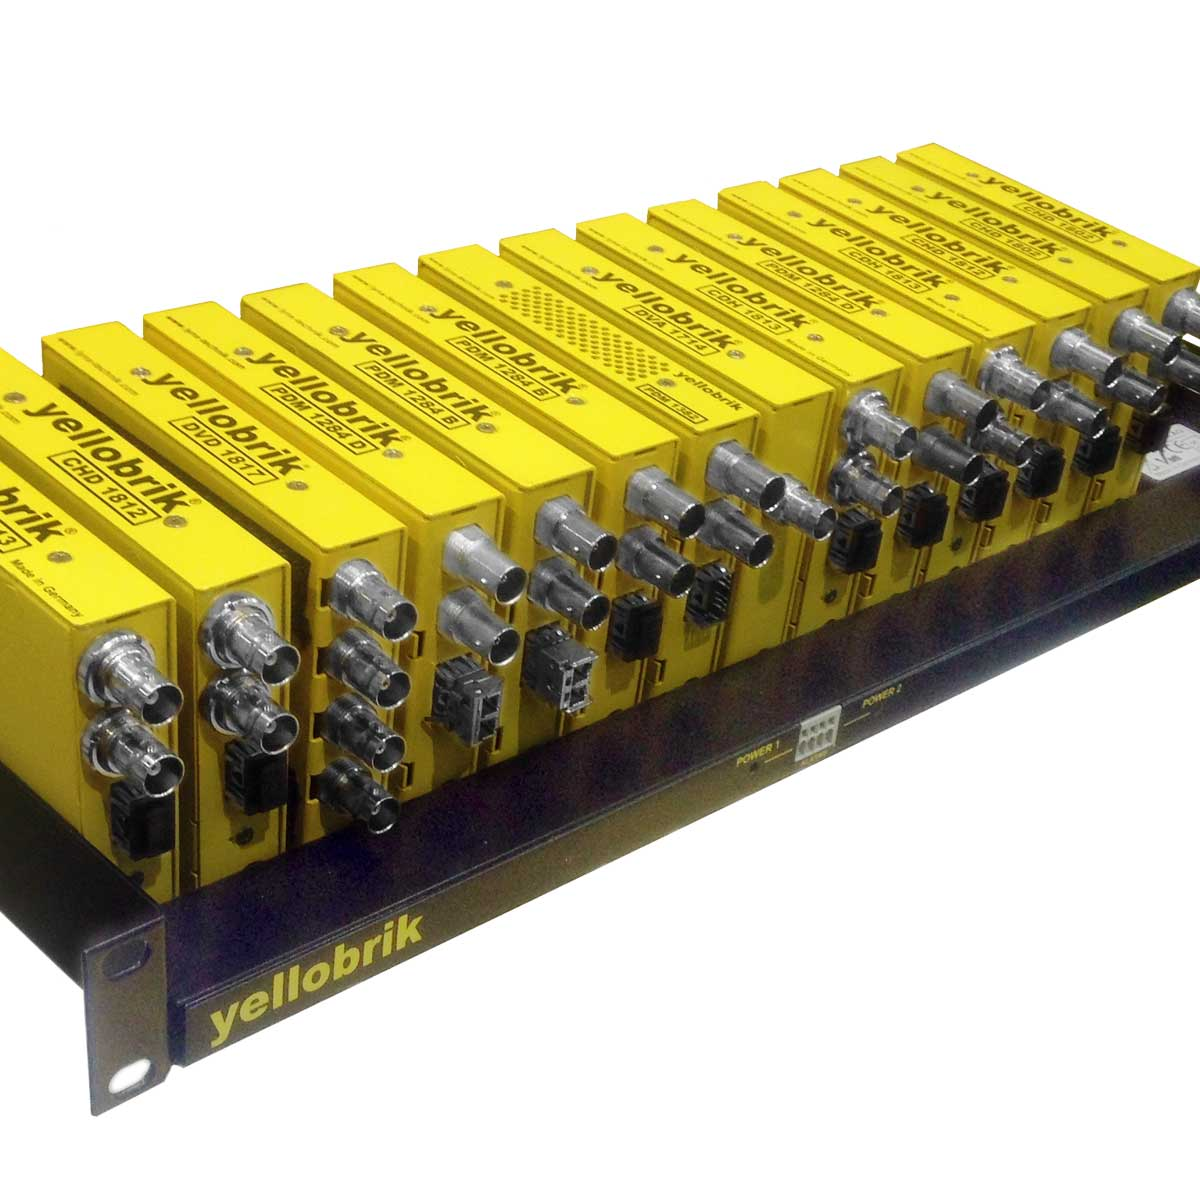 yellobrik modules in RFR 1000 Frame